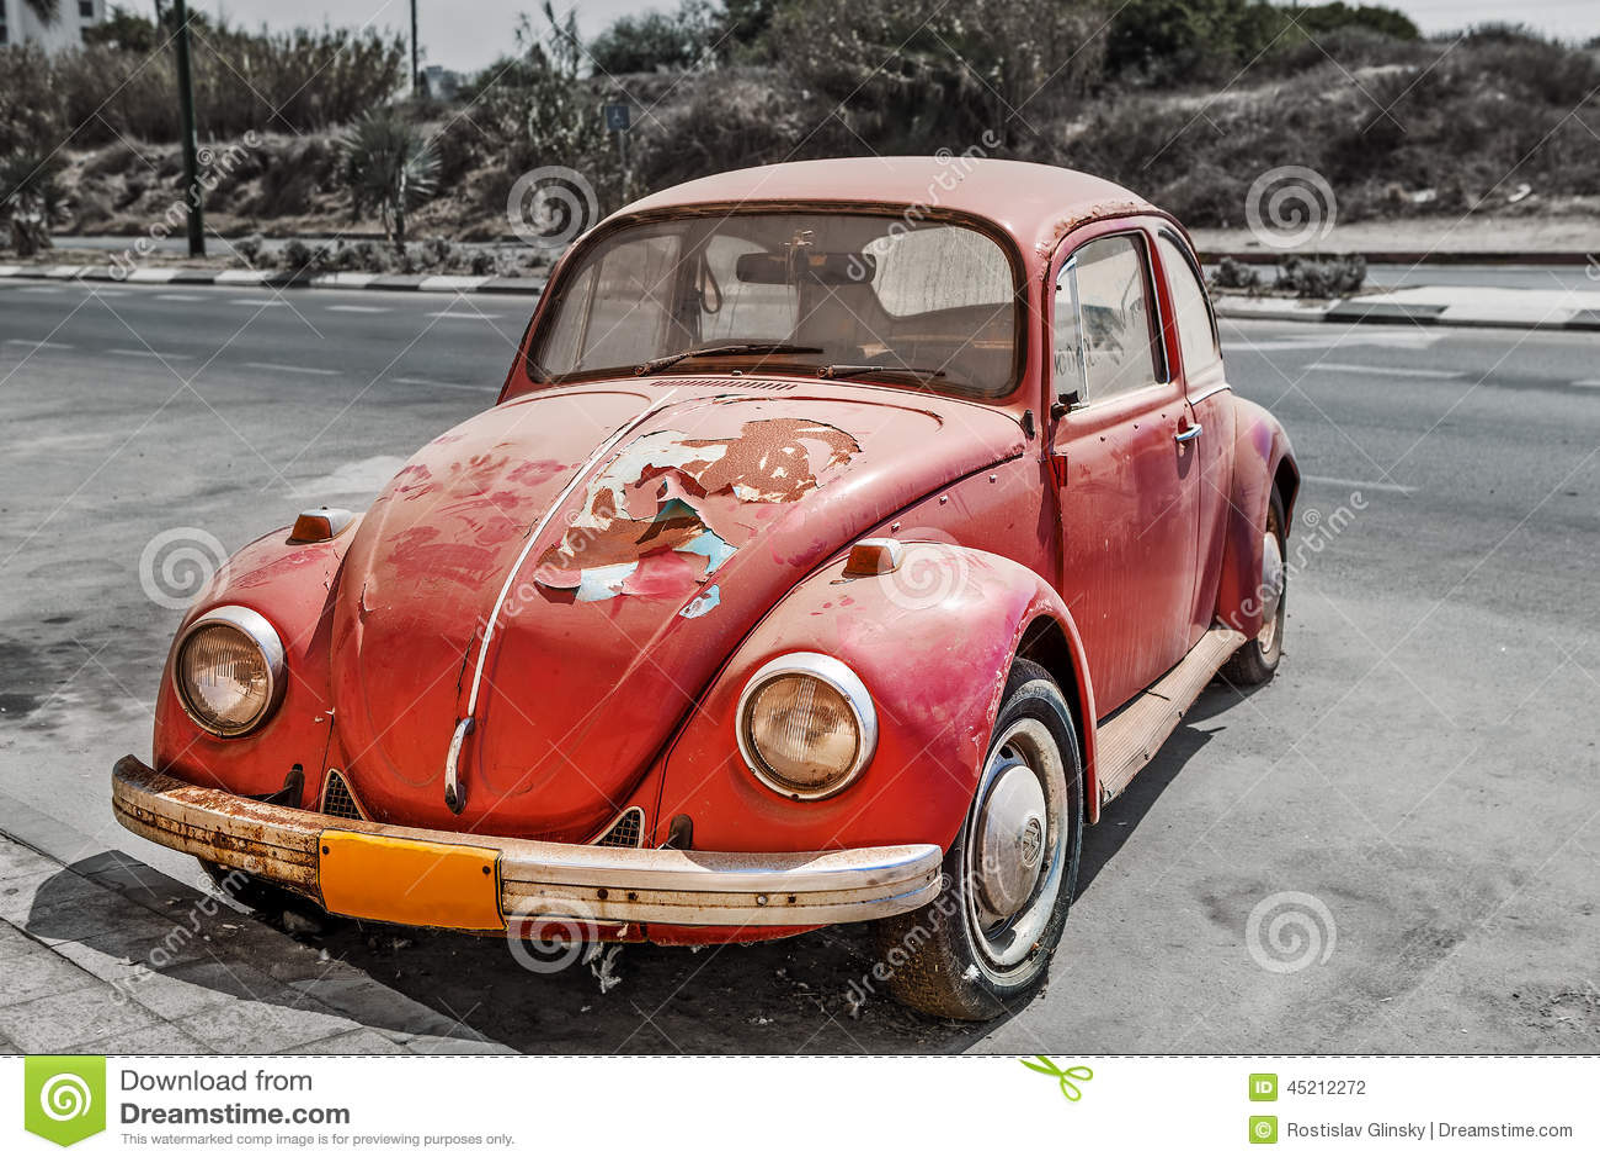 ... and officially called Volkswagen Type 1 (informally Volkswagen Bug